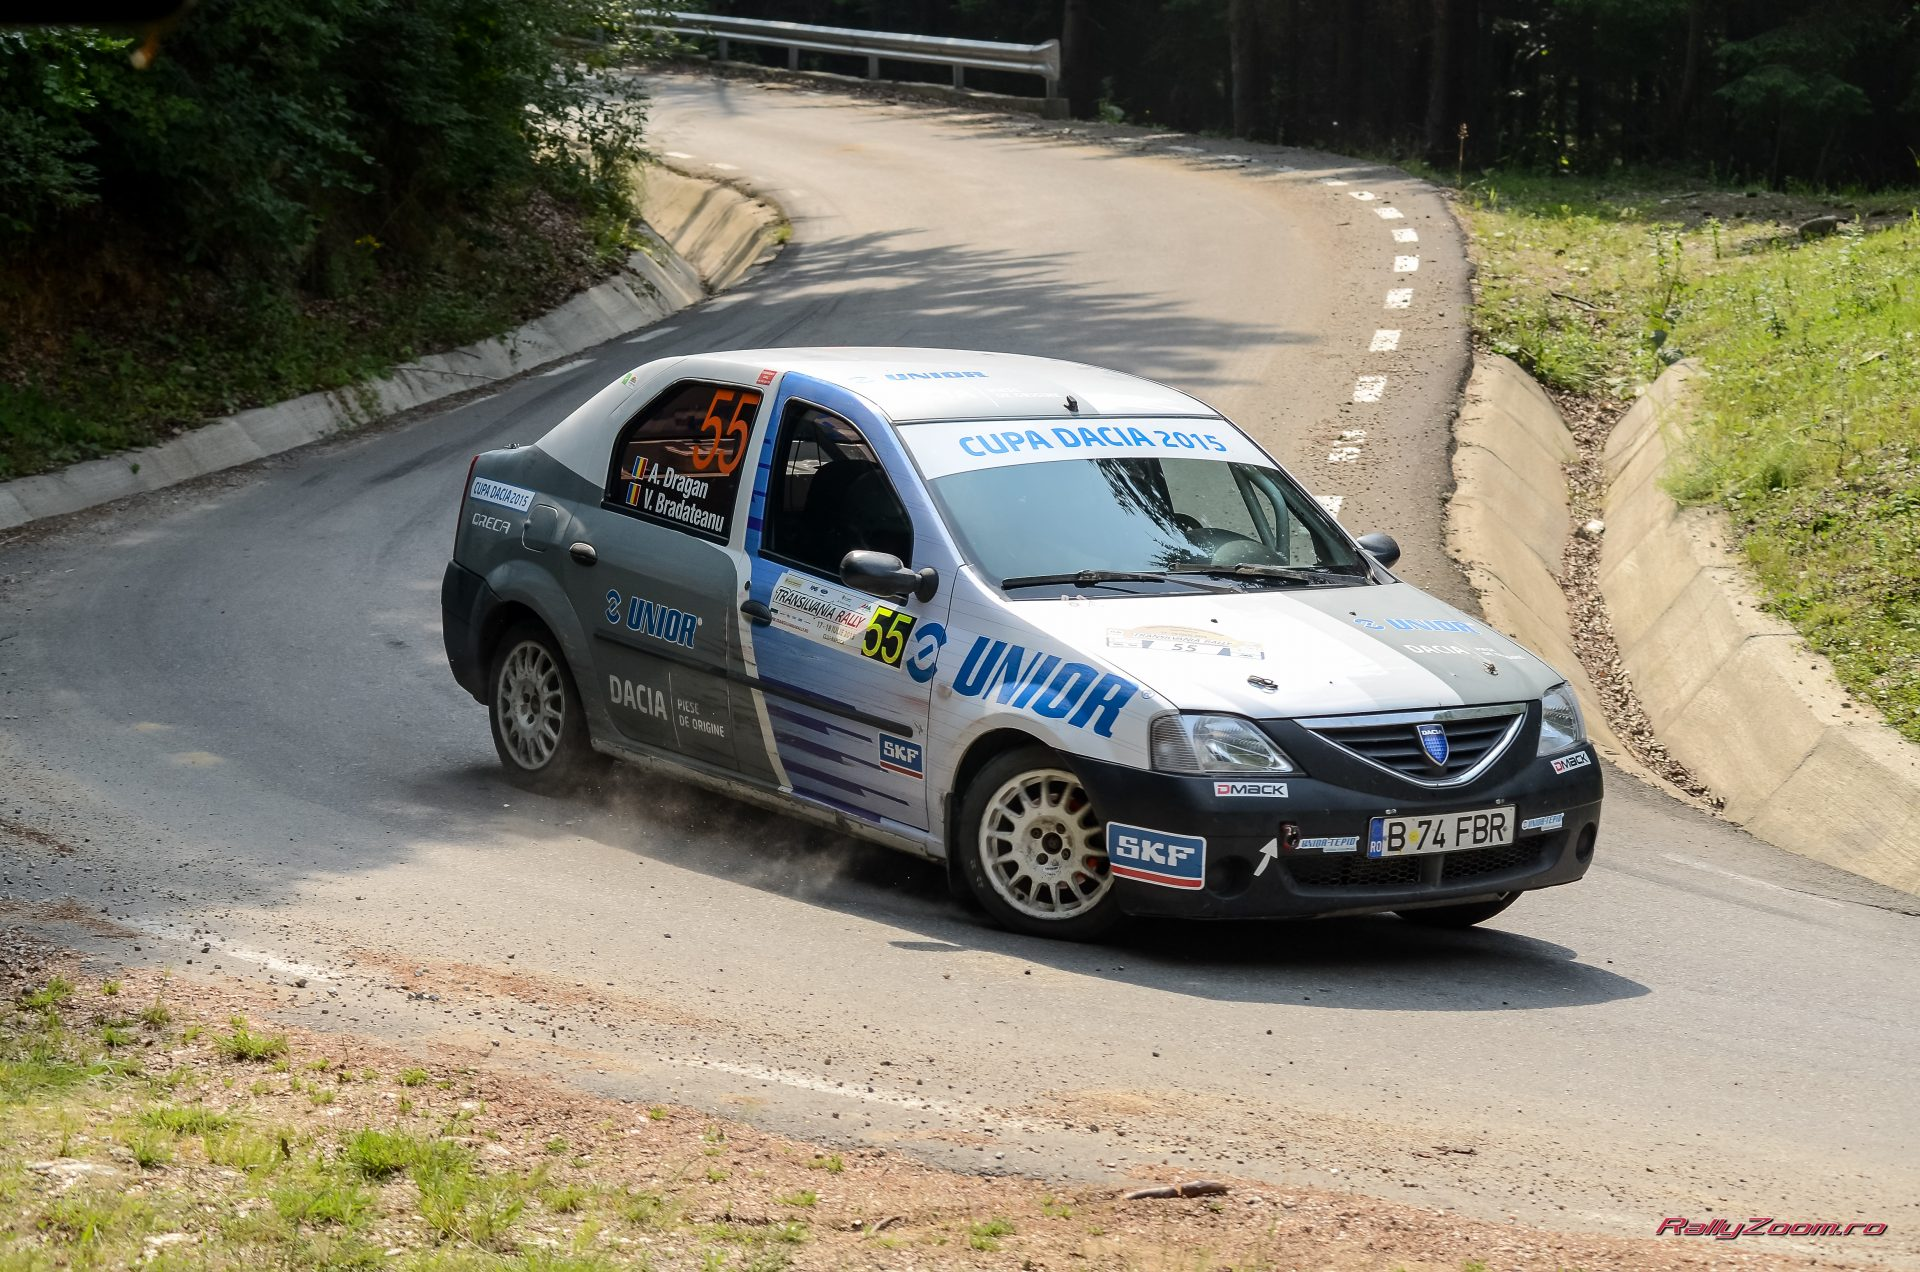 Cupa DACIA 2015 ? Sapte echipaje se lupta pentru podium la Sibiu Rally Challenge